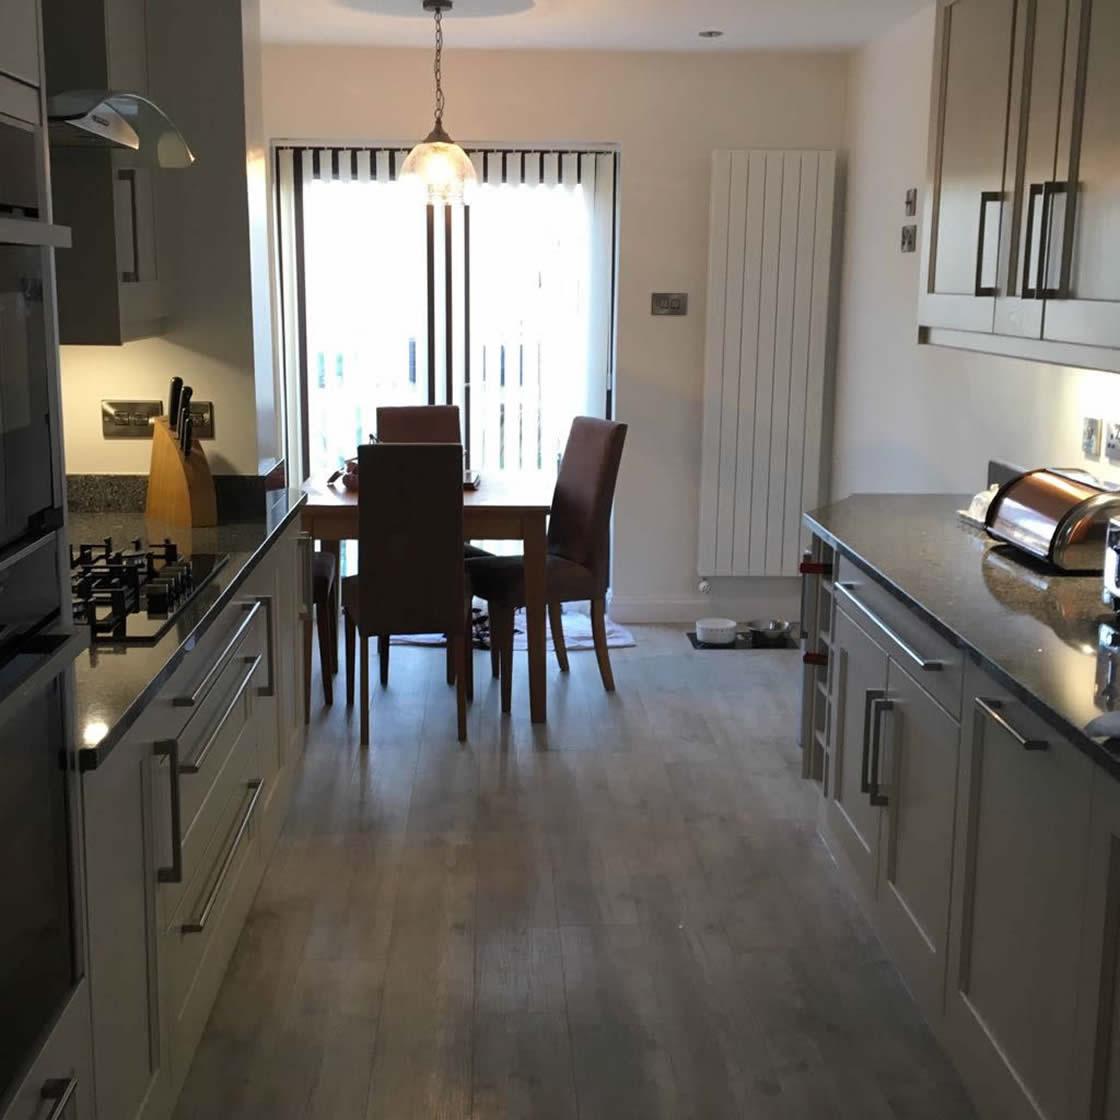 Bespoke Kitchen Installation in Carshalton Beeches Surrey